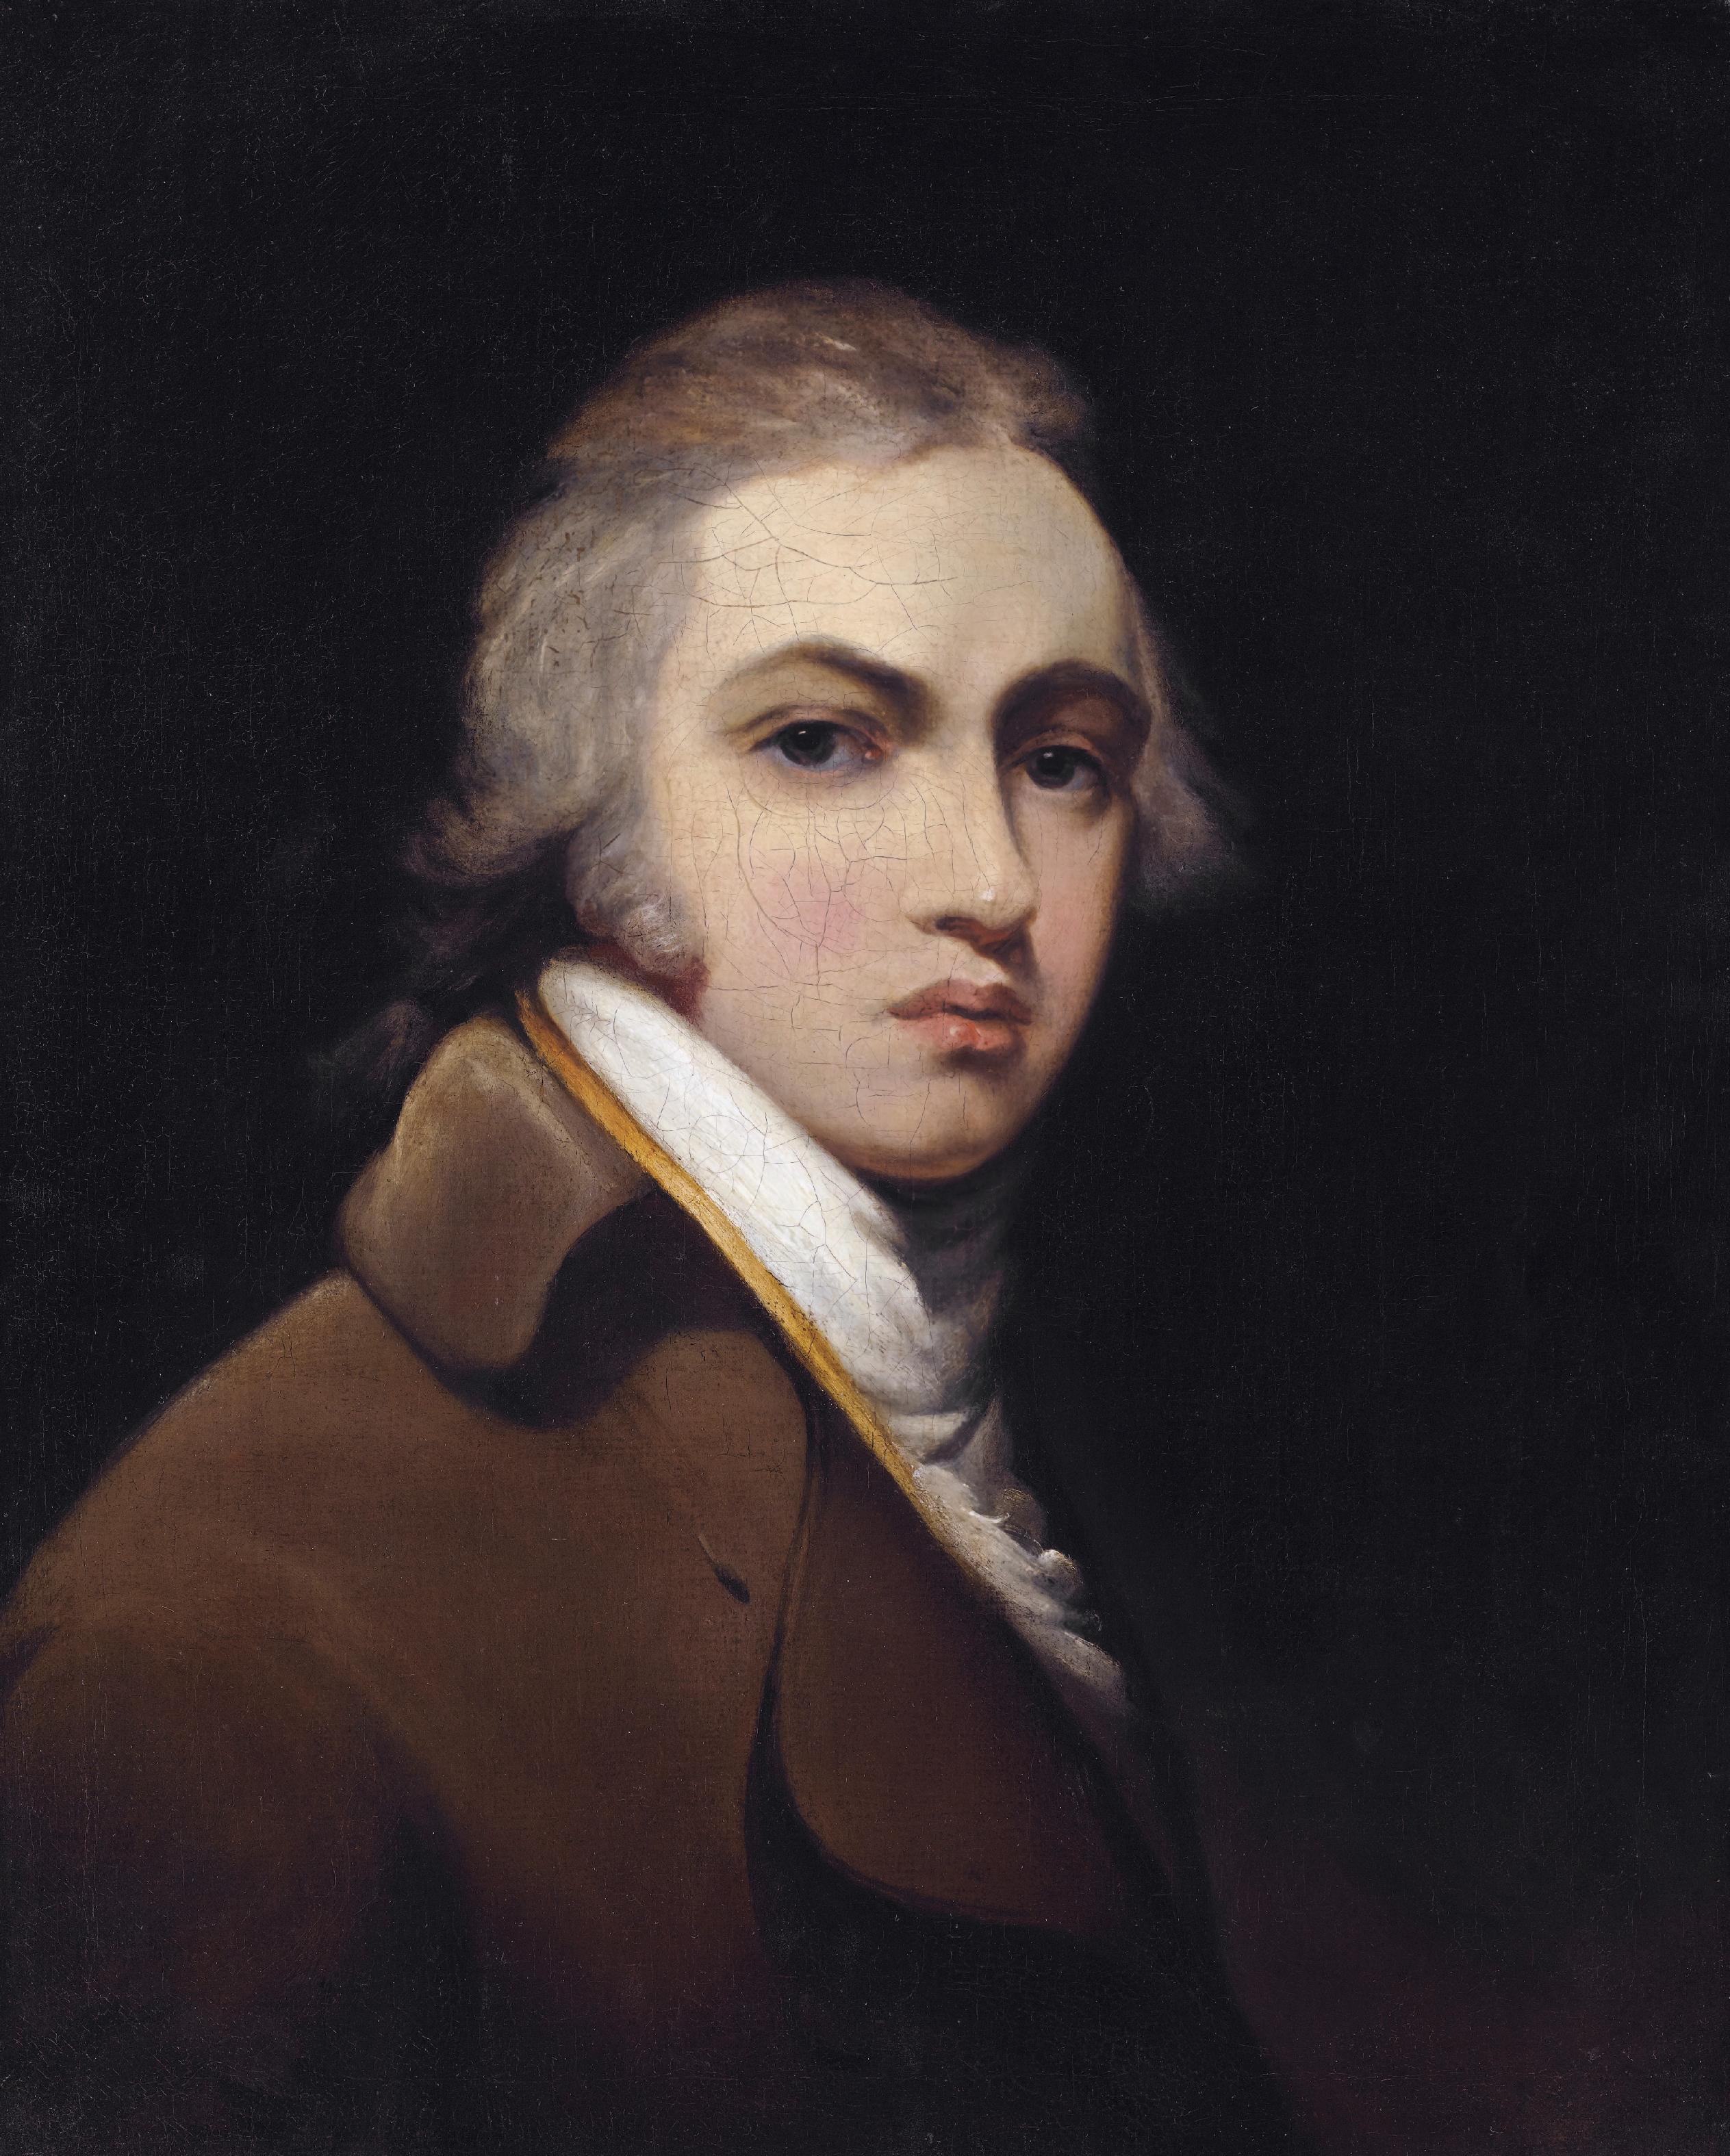 https://upload.wikimedia.org/wikipedia/commons/b/b5/Sir_Thomas_Lawrence01.jpg